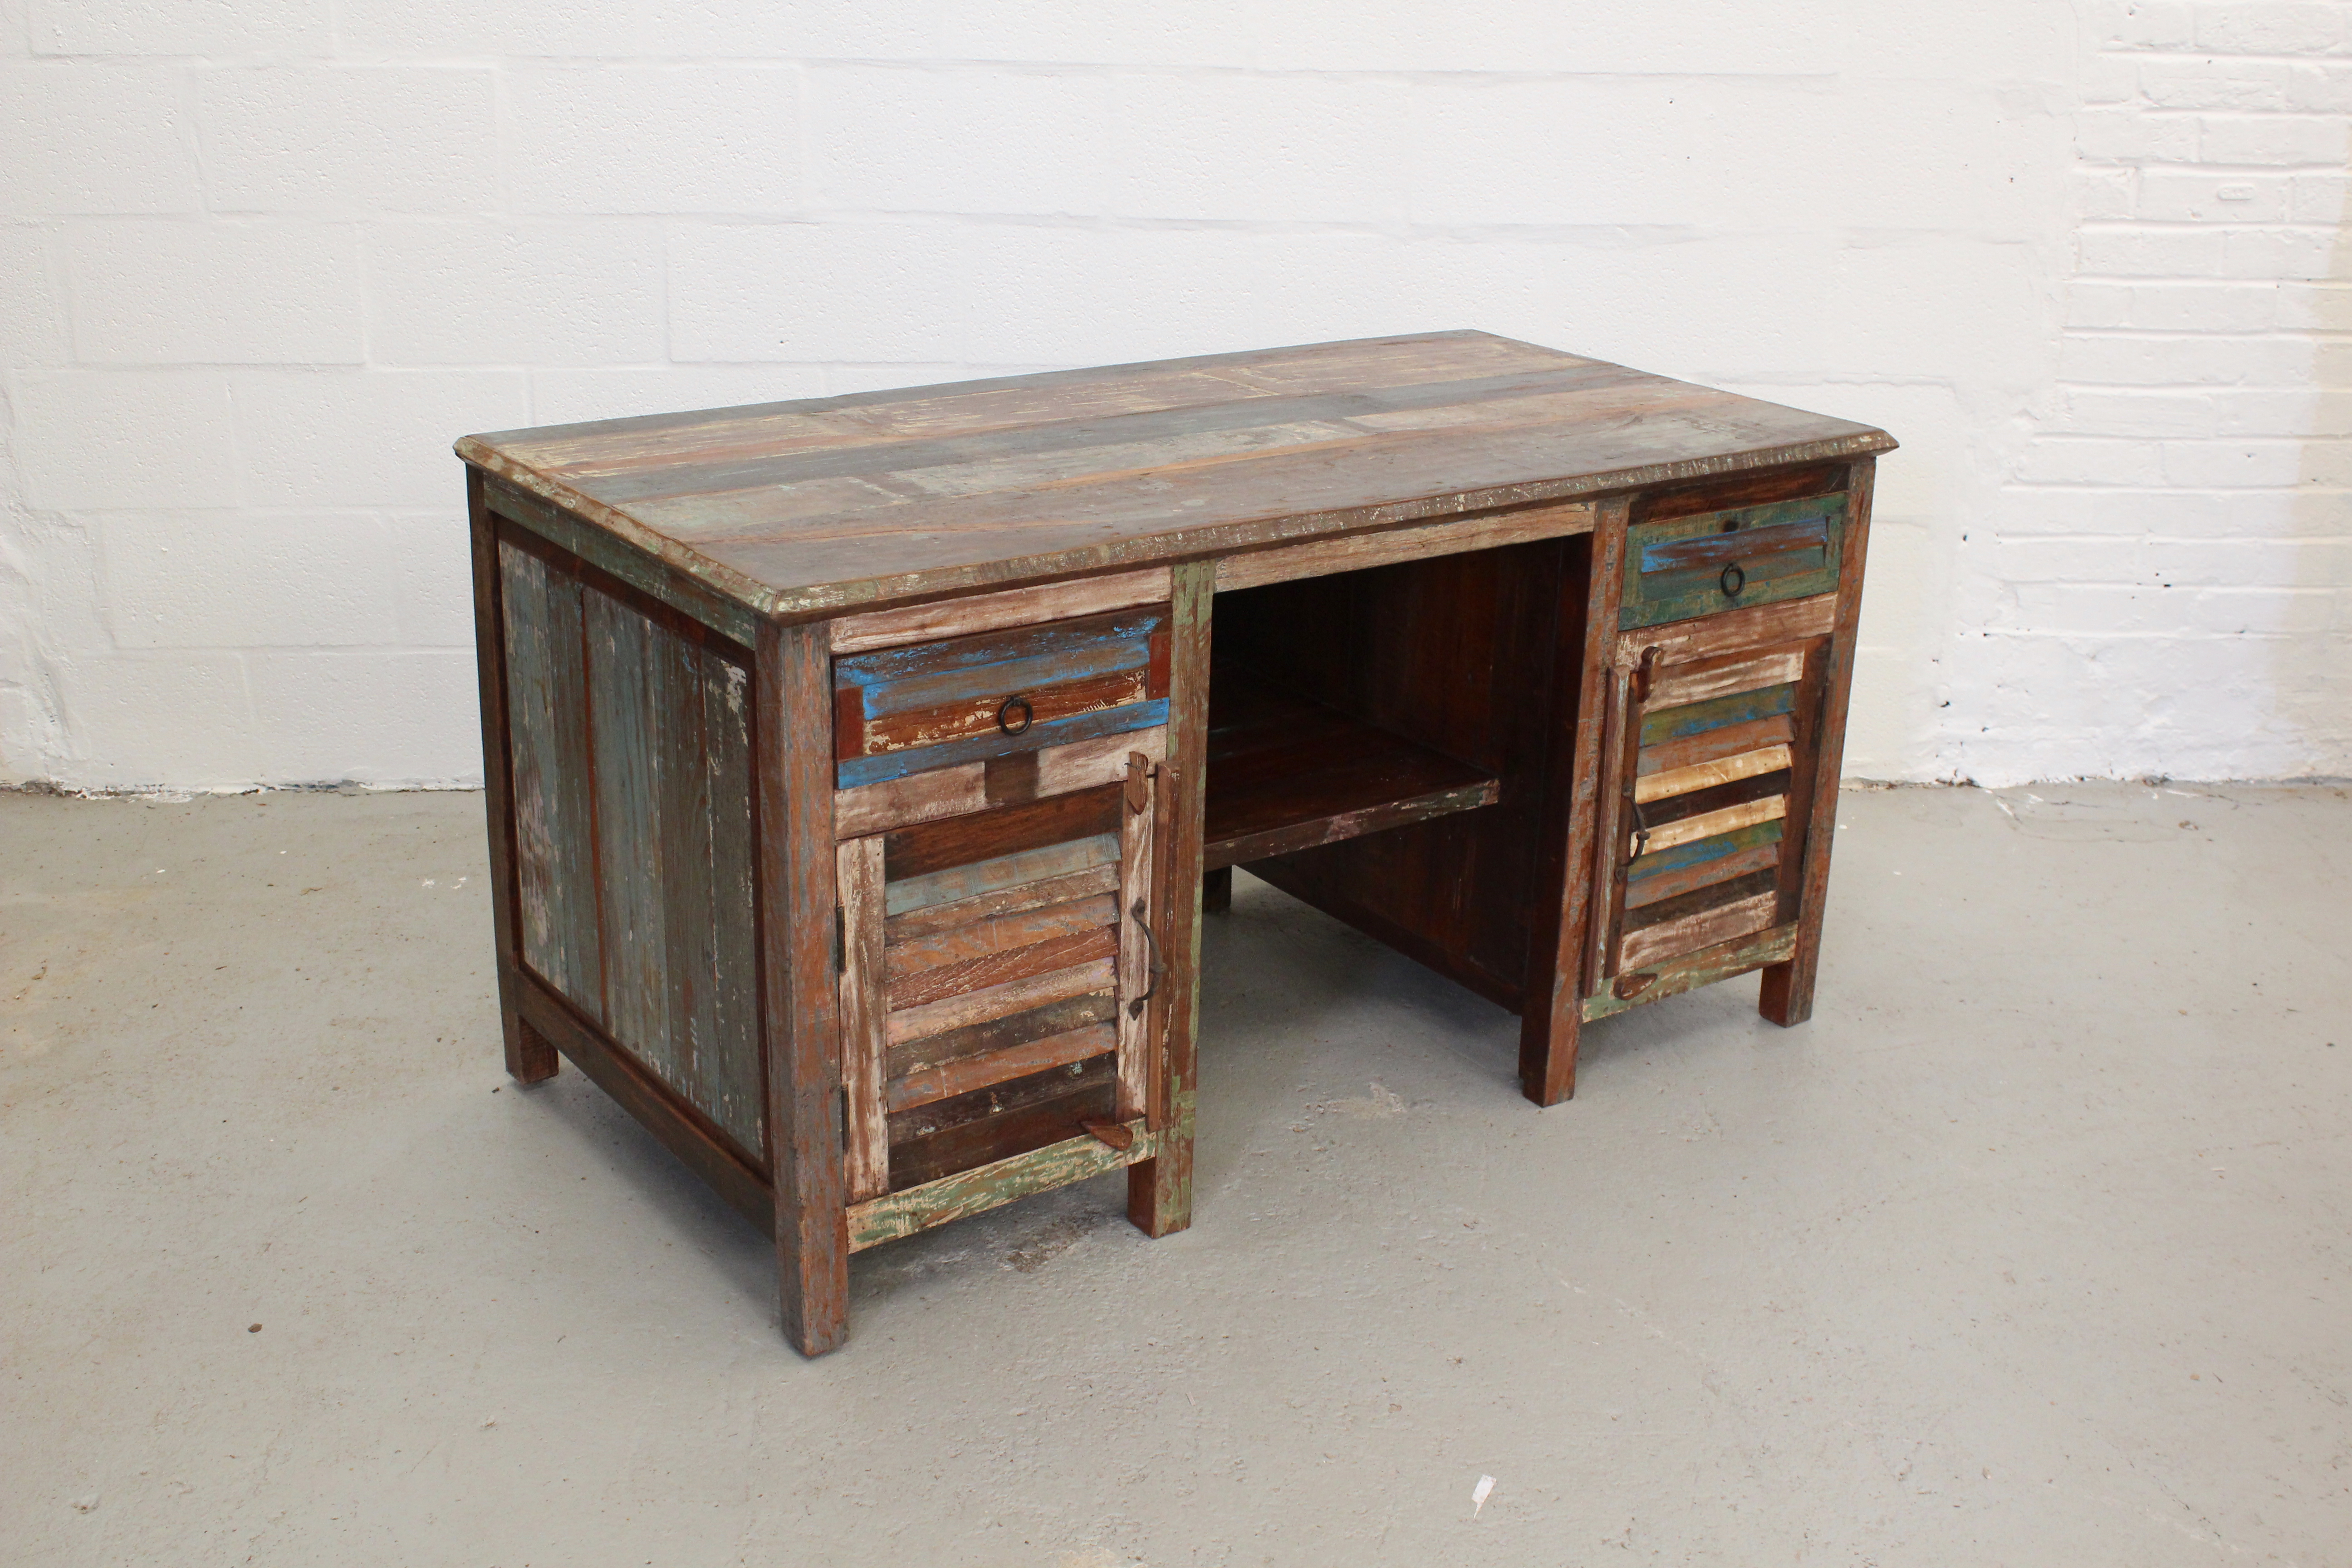 TS00053 SIBIU Colourful Reclaimed Desk